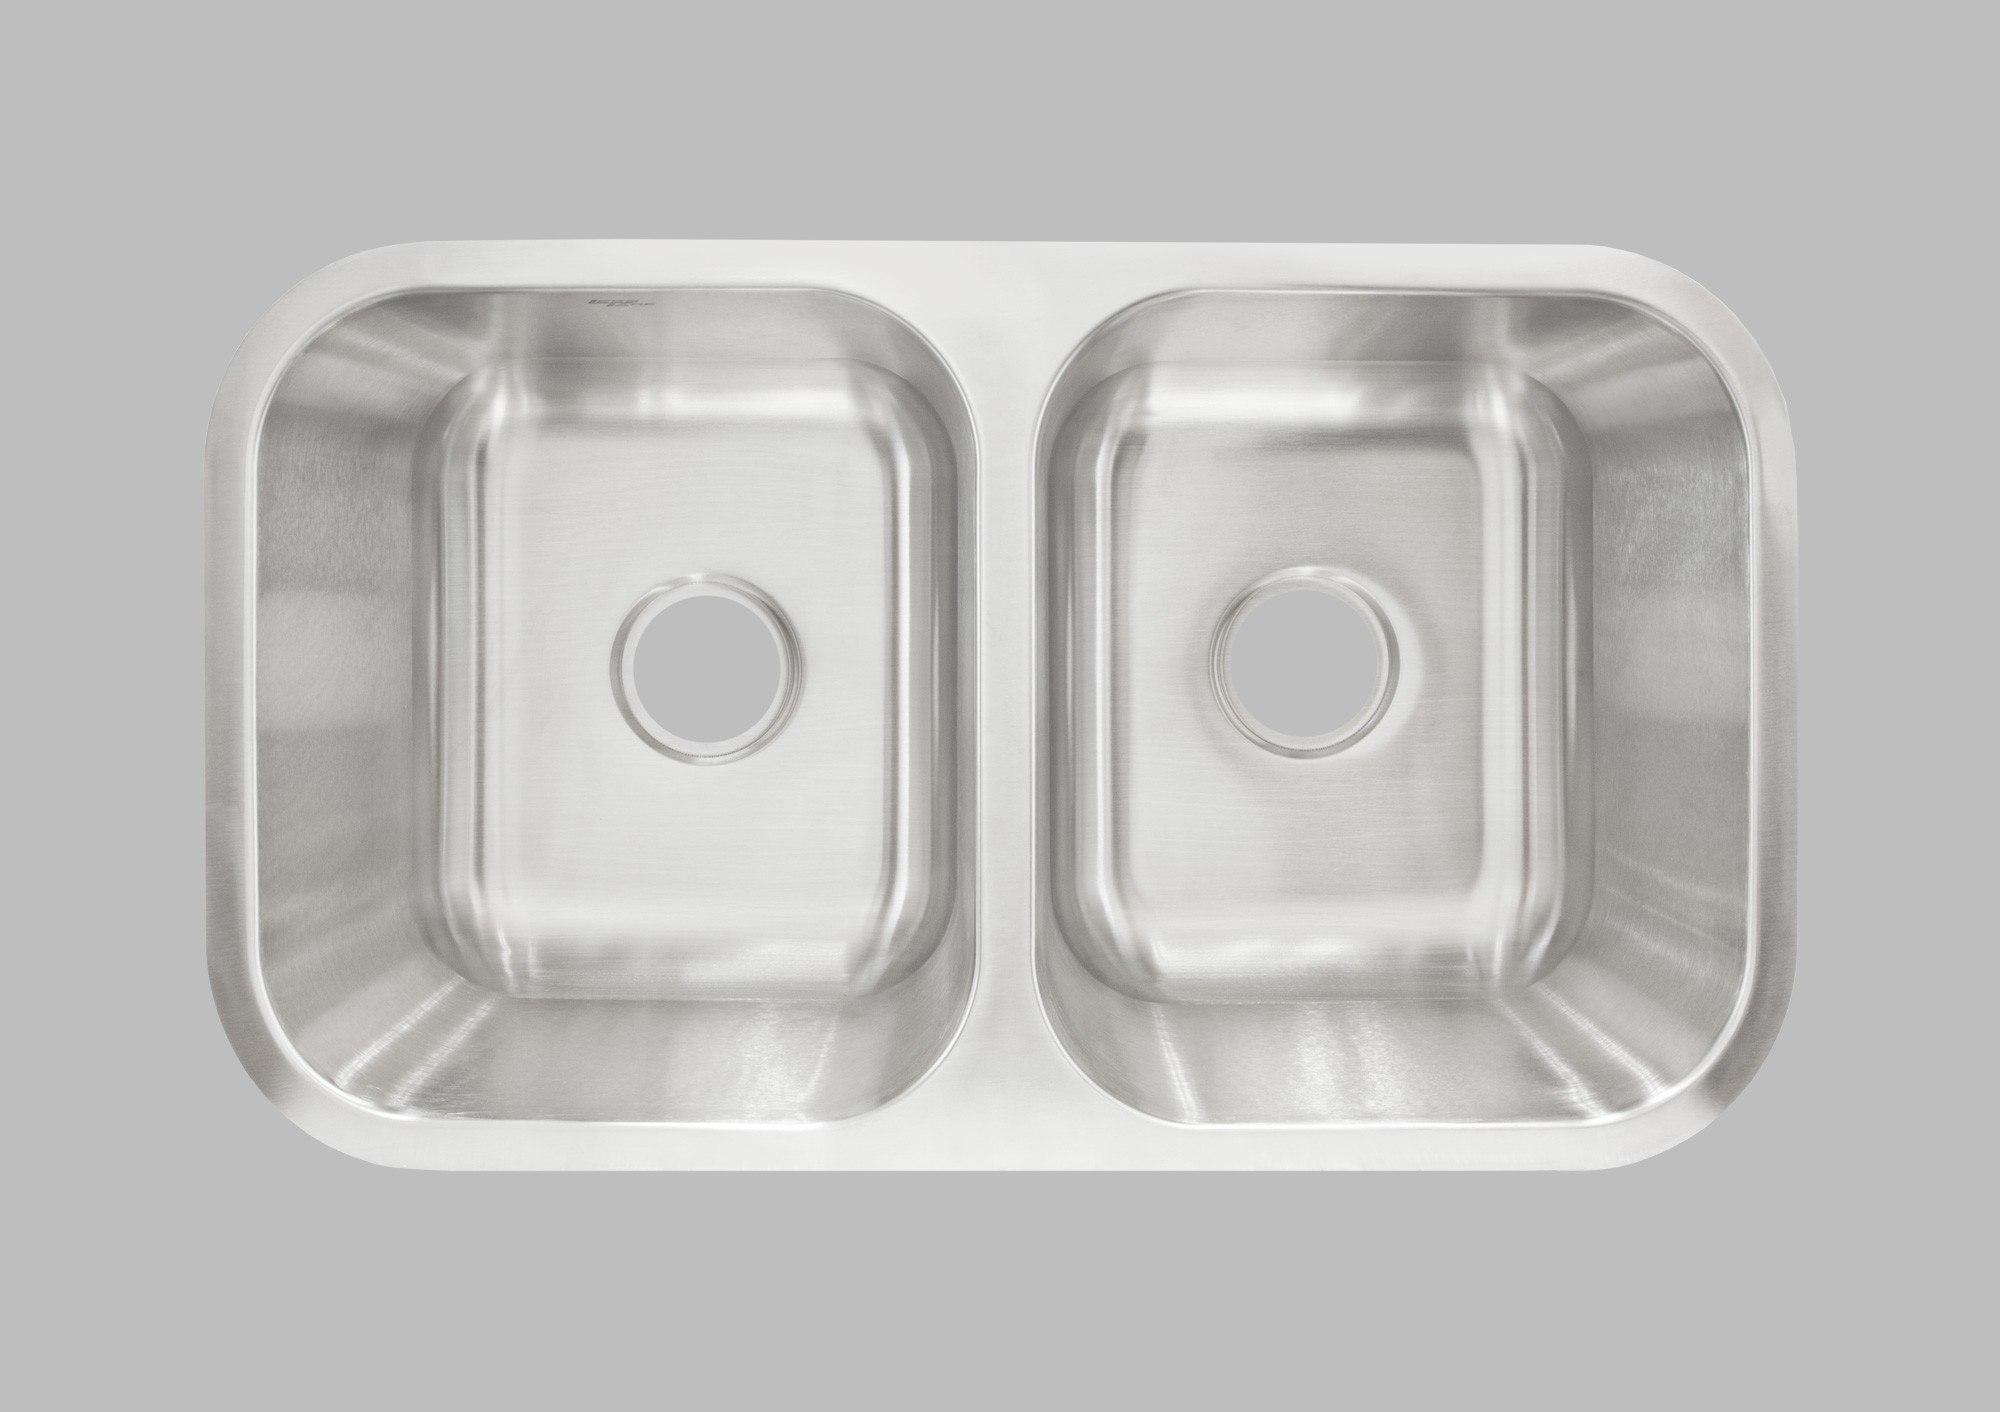 Less Care L205 31 Inch Undermount Double Bowl Kitchen Sink Kitchen ...